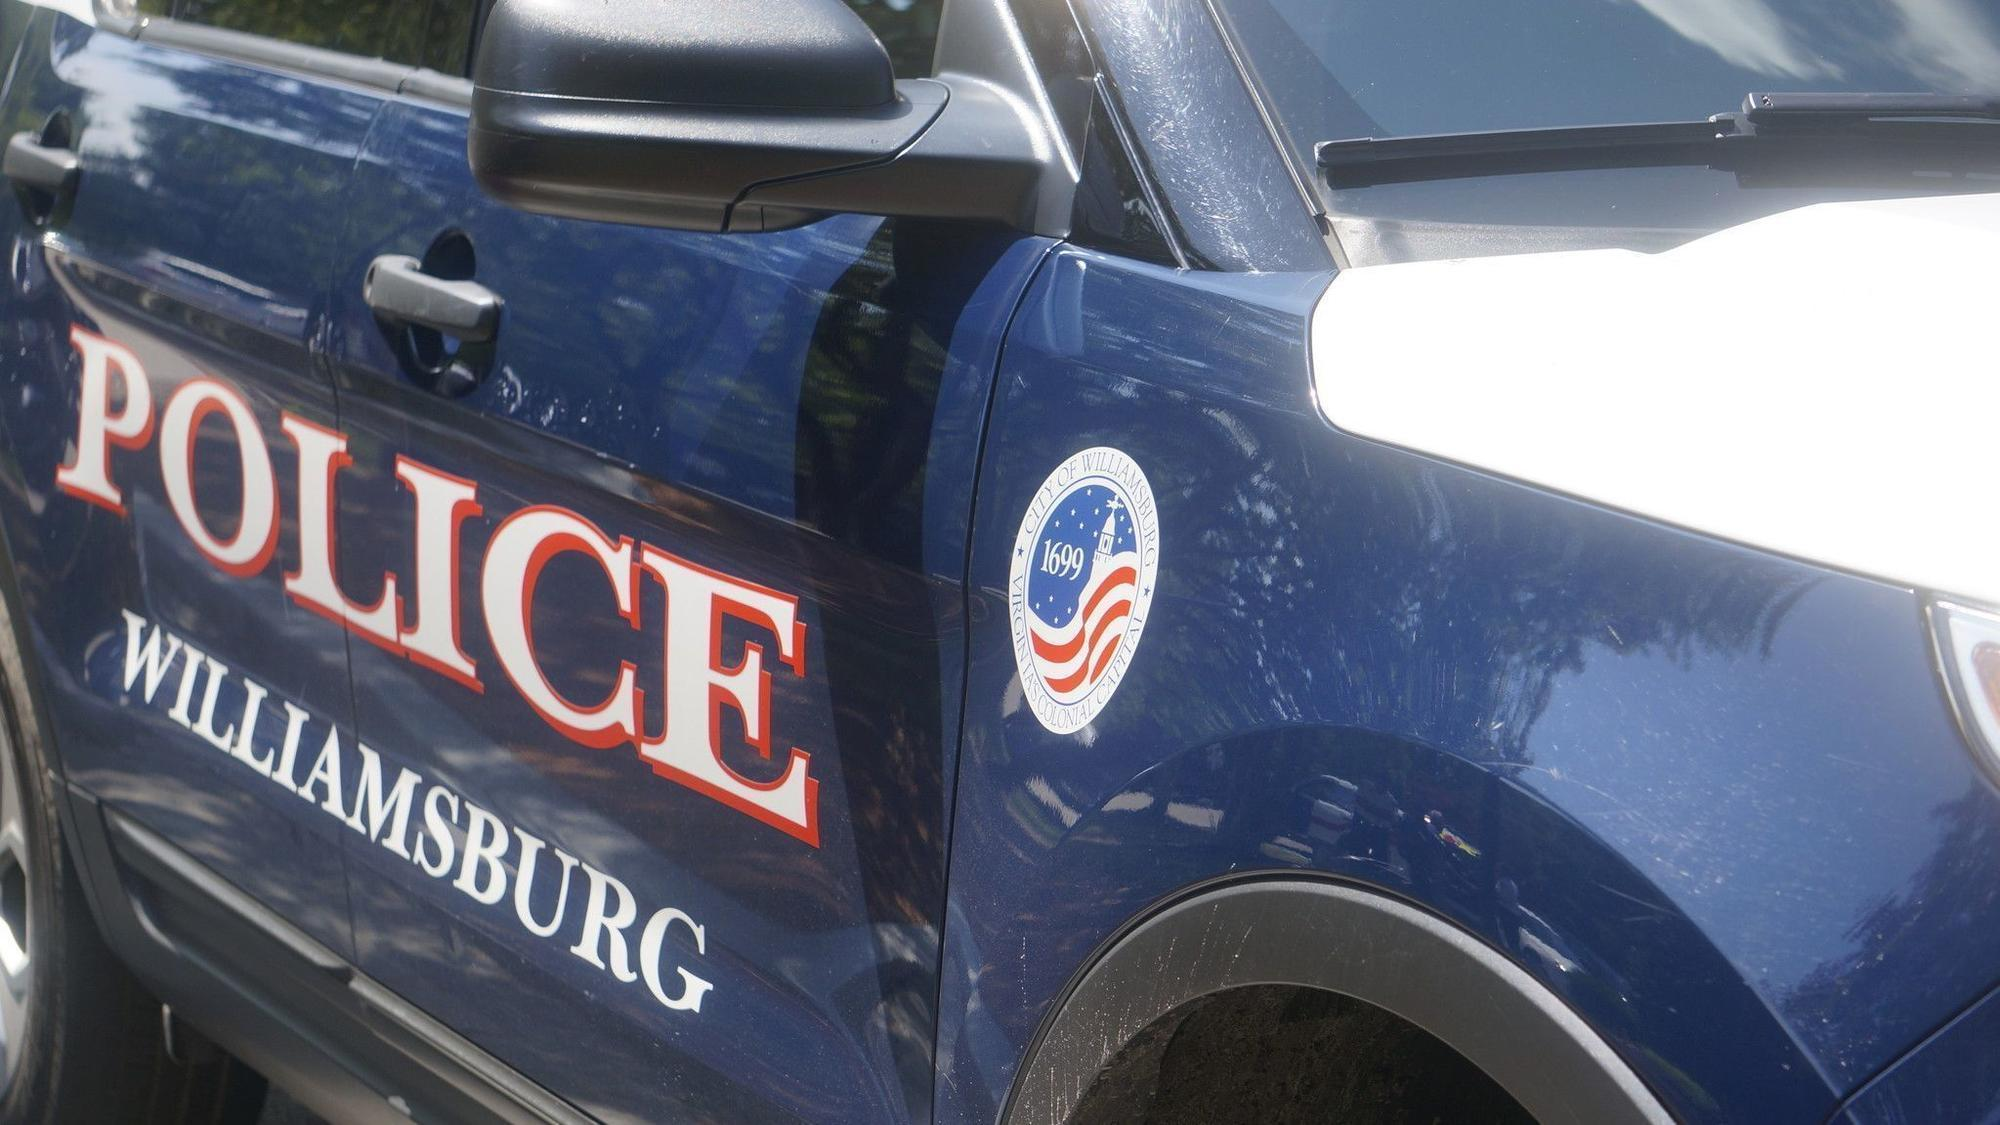 Police seek help to locate Mazda impersonating Williamsburg police